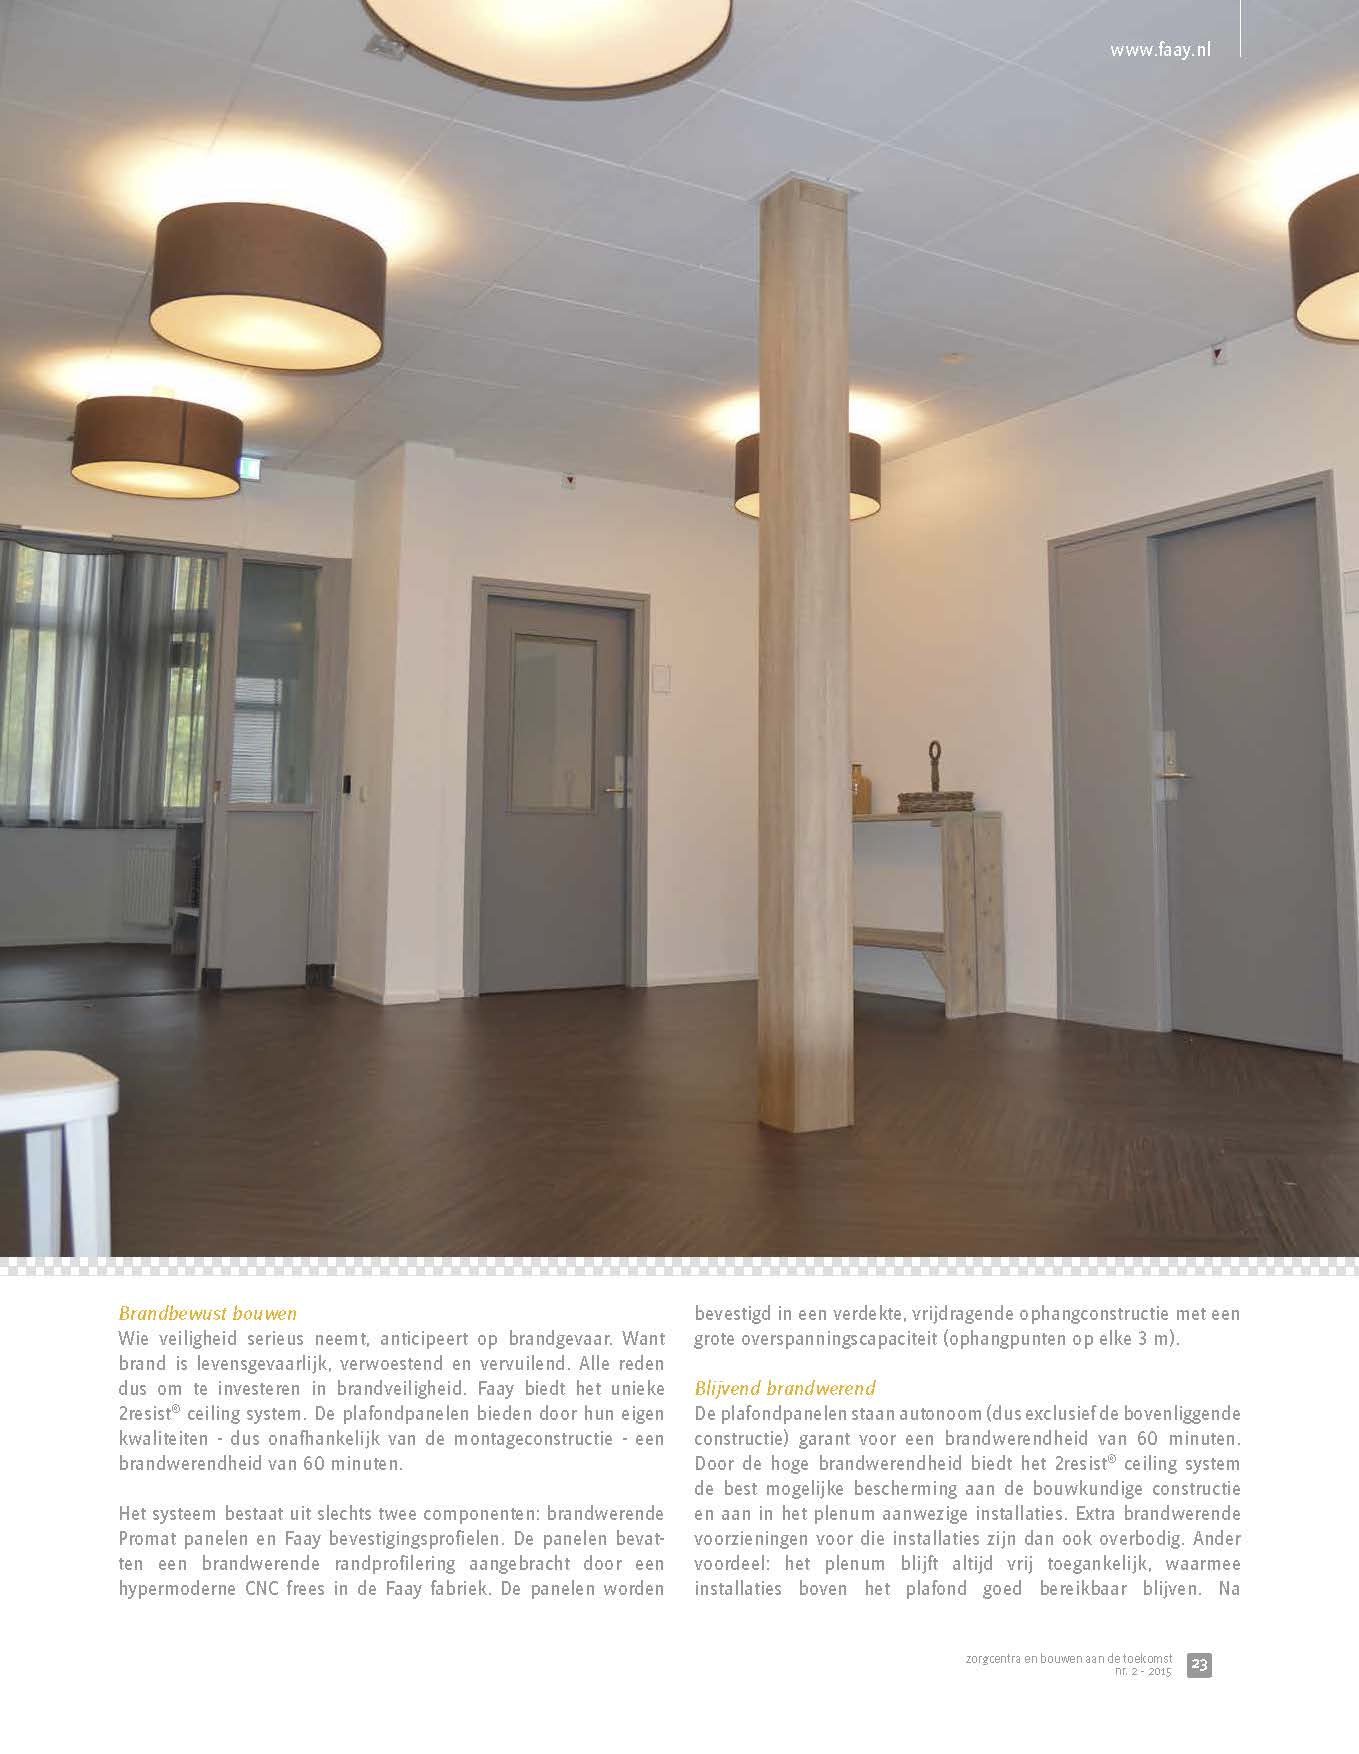 Faay Wanden en Plafonds - 2Resist 60 ceiling system - zorgcentra